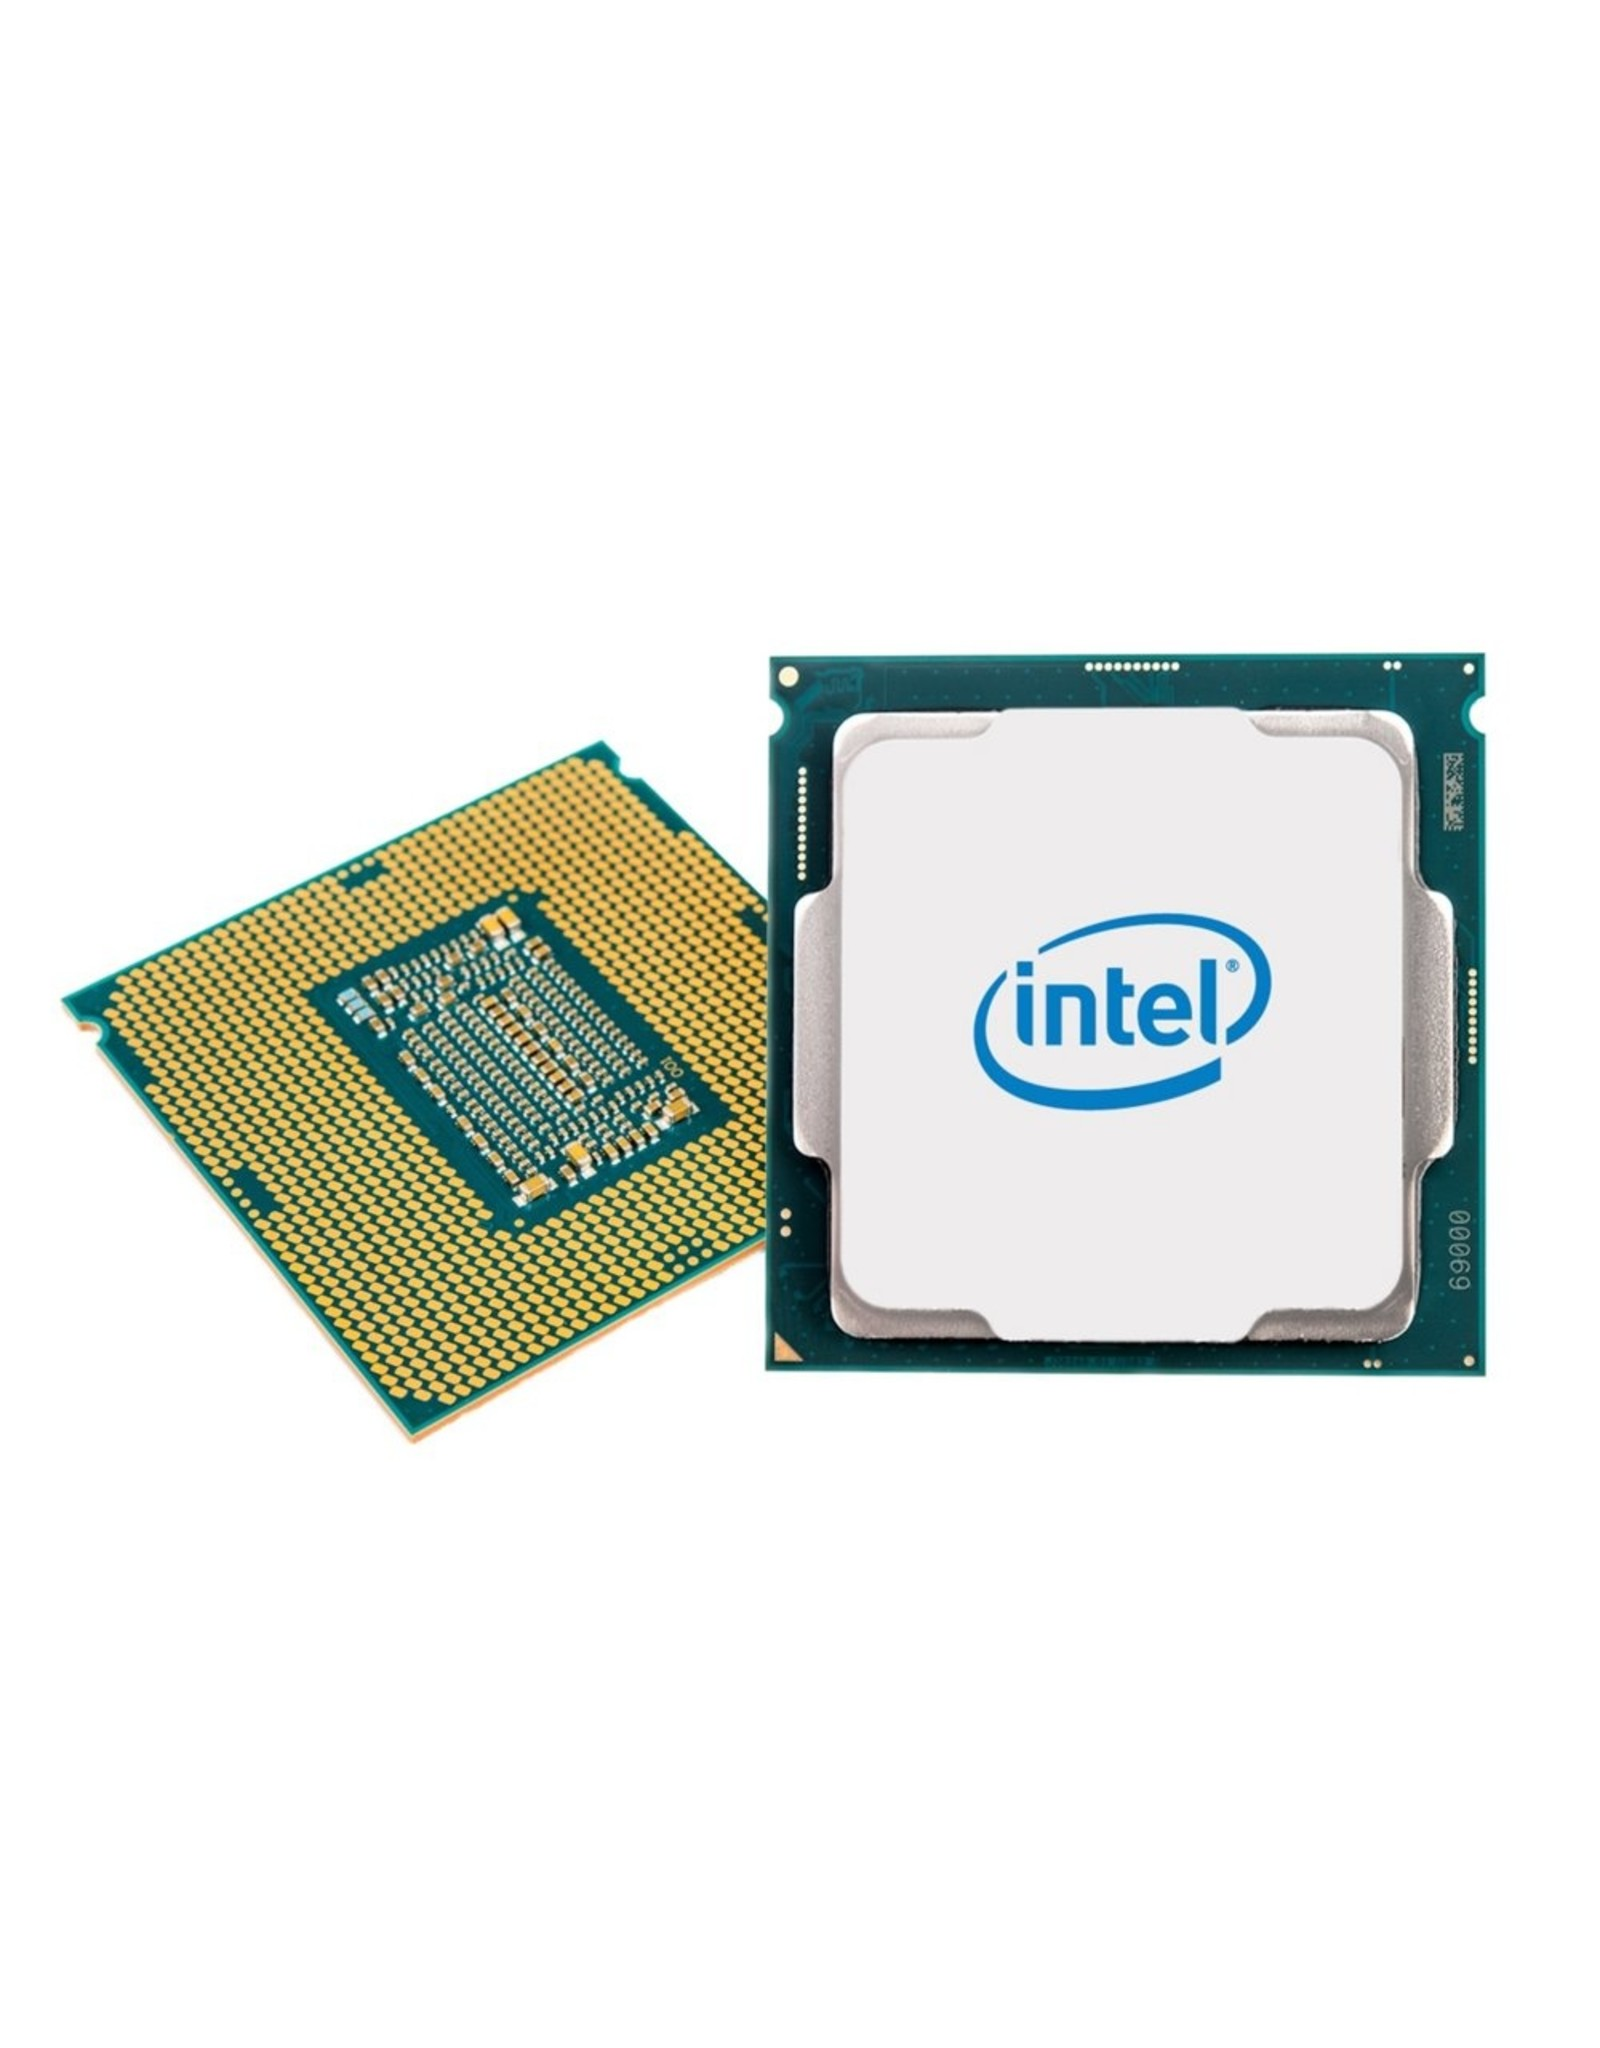 Intel CPU ® Core™ i3-9100F 9th 3.6Ghz Quad LGA1151v2 no GPU